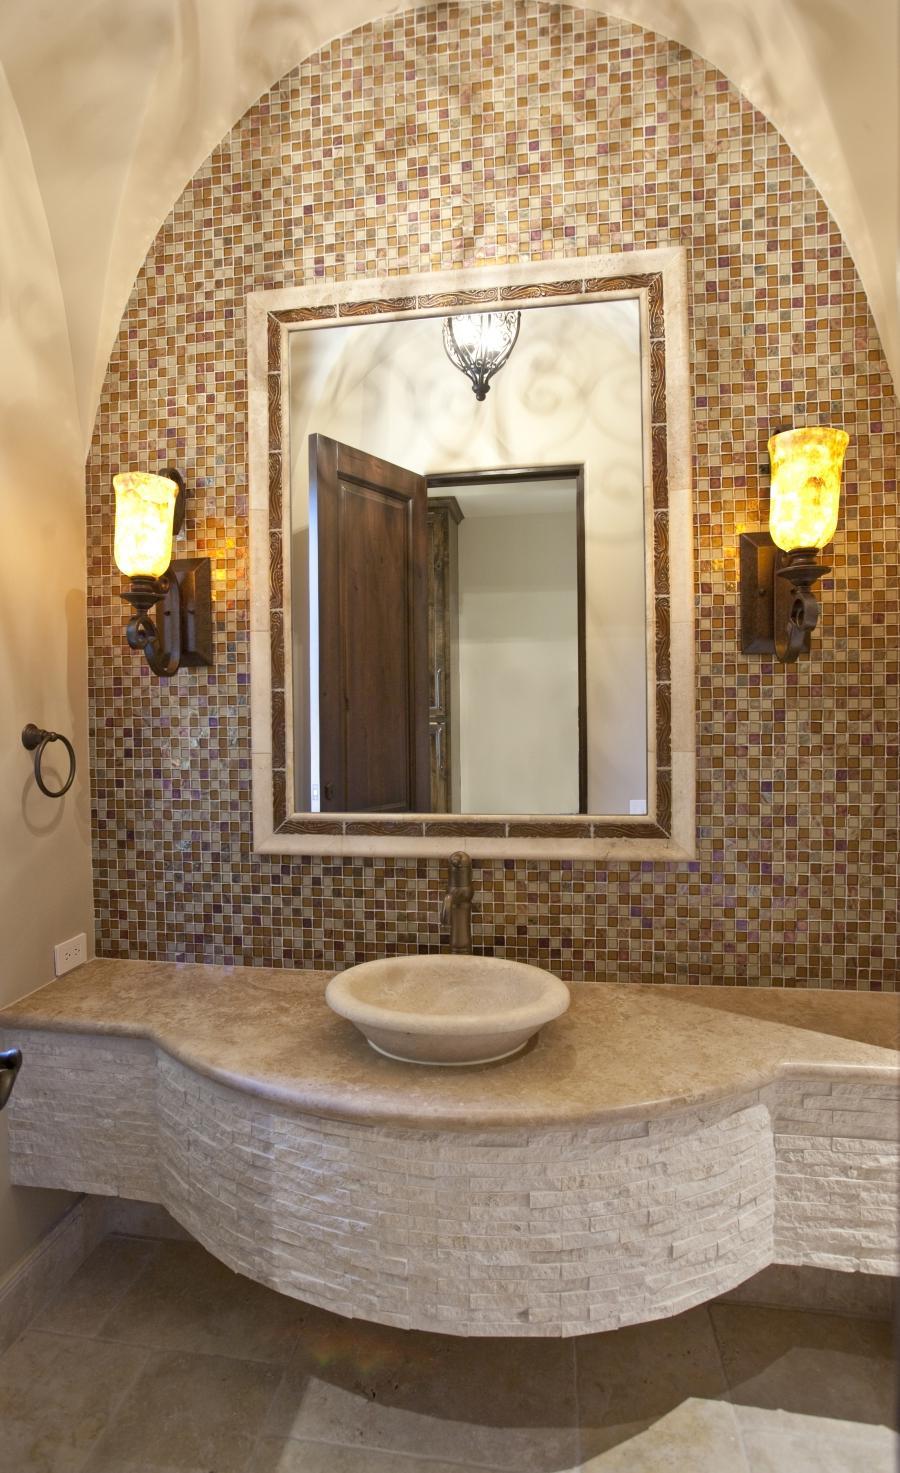 Bathroom showcase bathroom showcase photos for Bathroom showcases near me